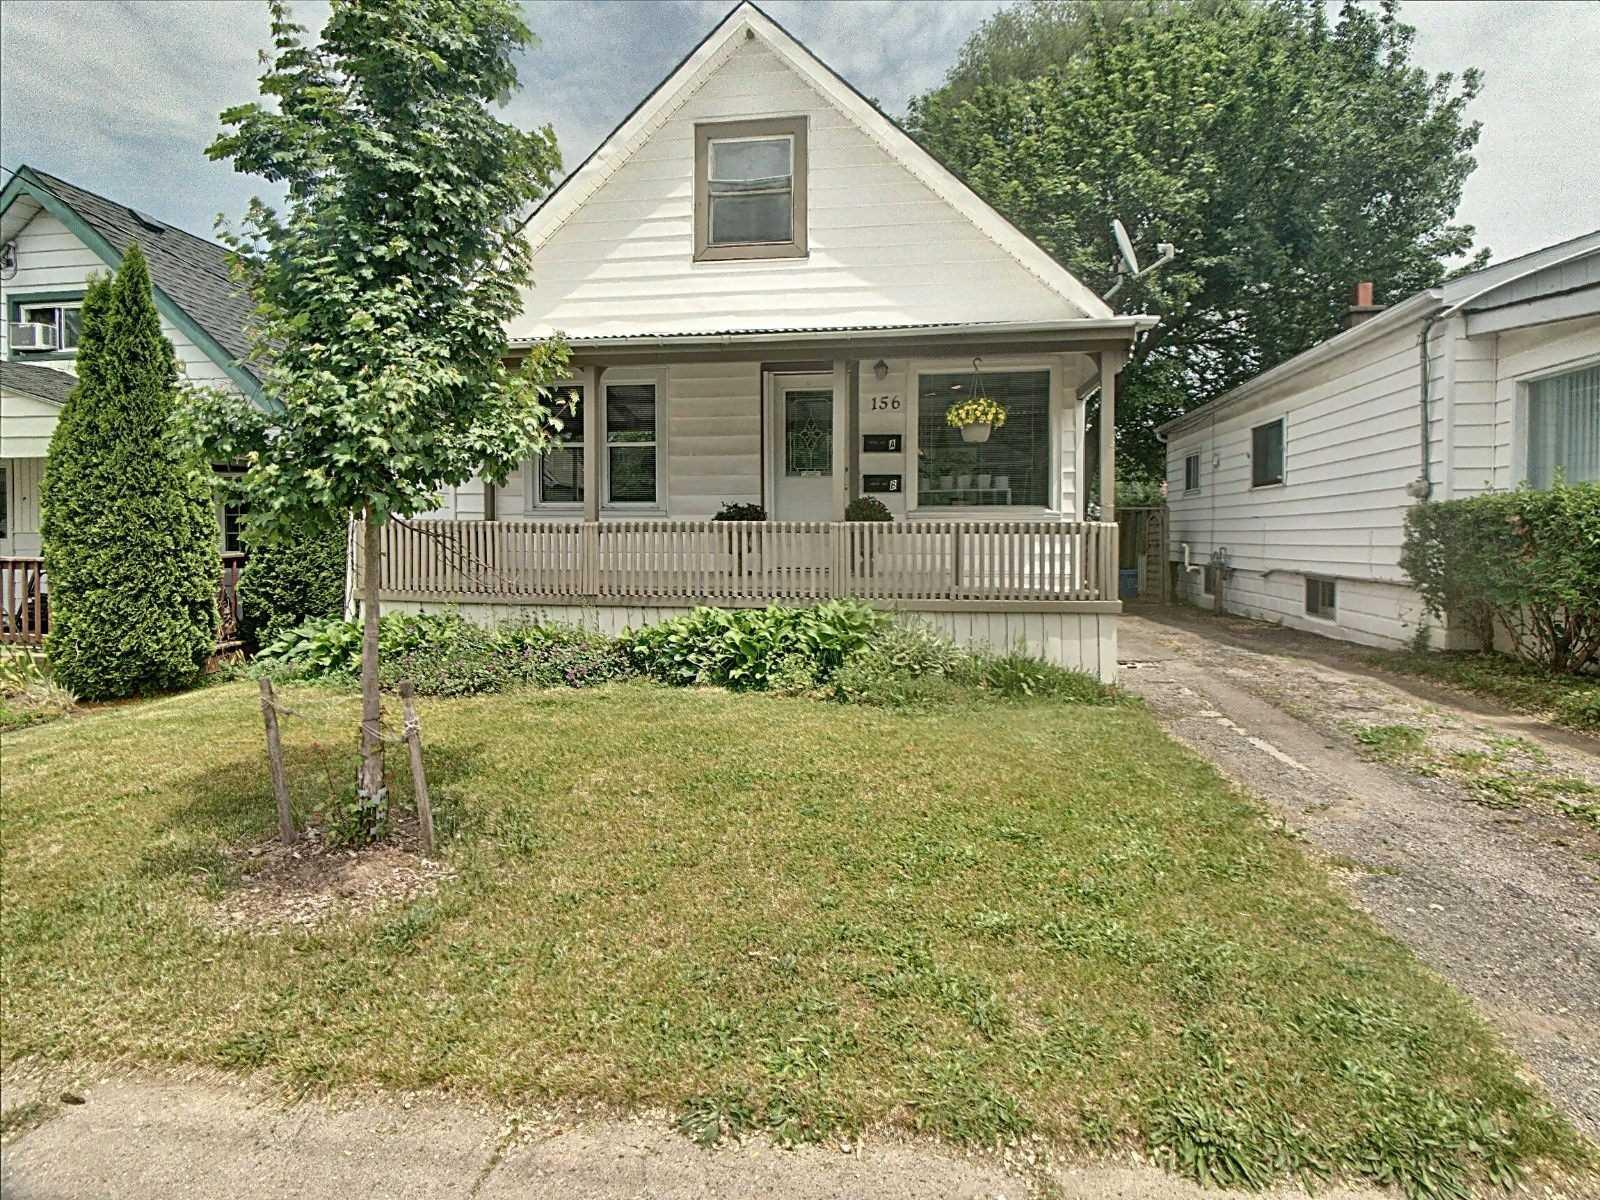 156 Giles St, London, Ontario N5Z2W1, 3 Bedrooms Bedrooms, ,2 BathroomsBathrooms,Duplex,For Sale,Giles,X5272855